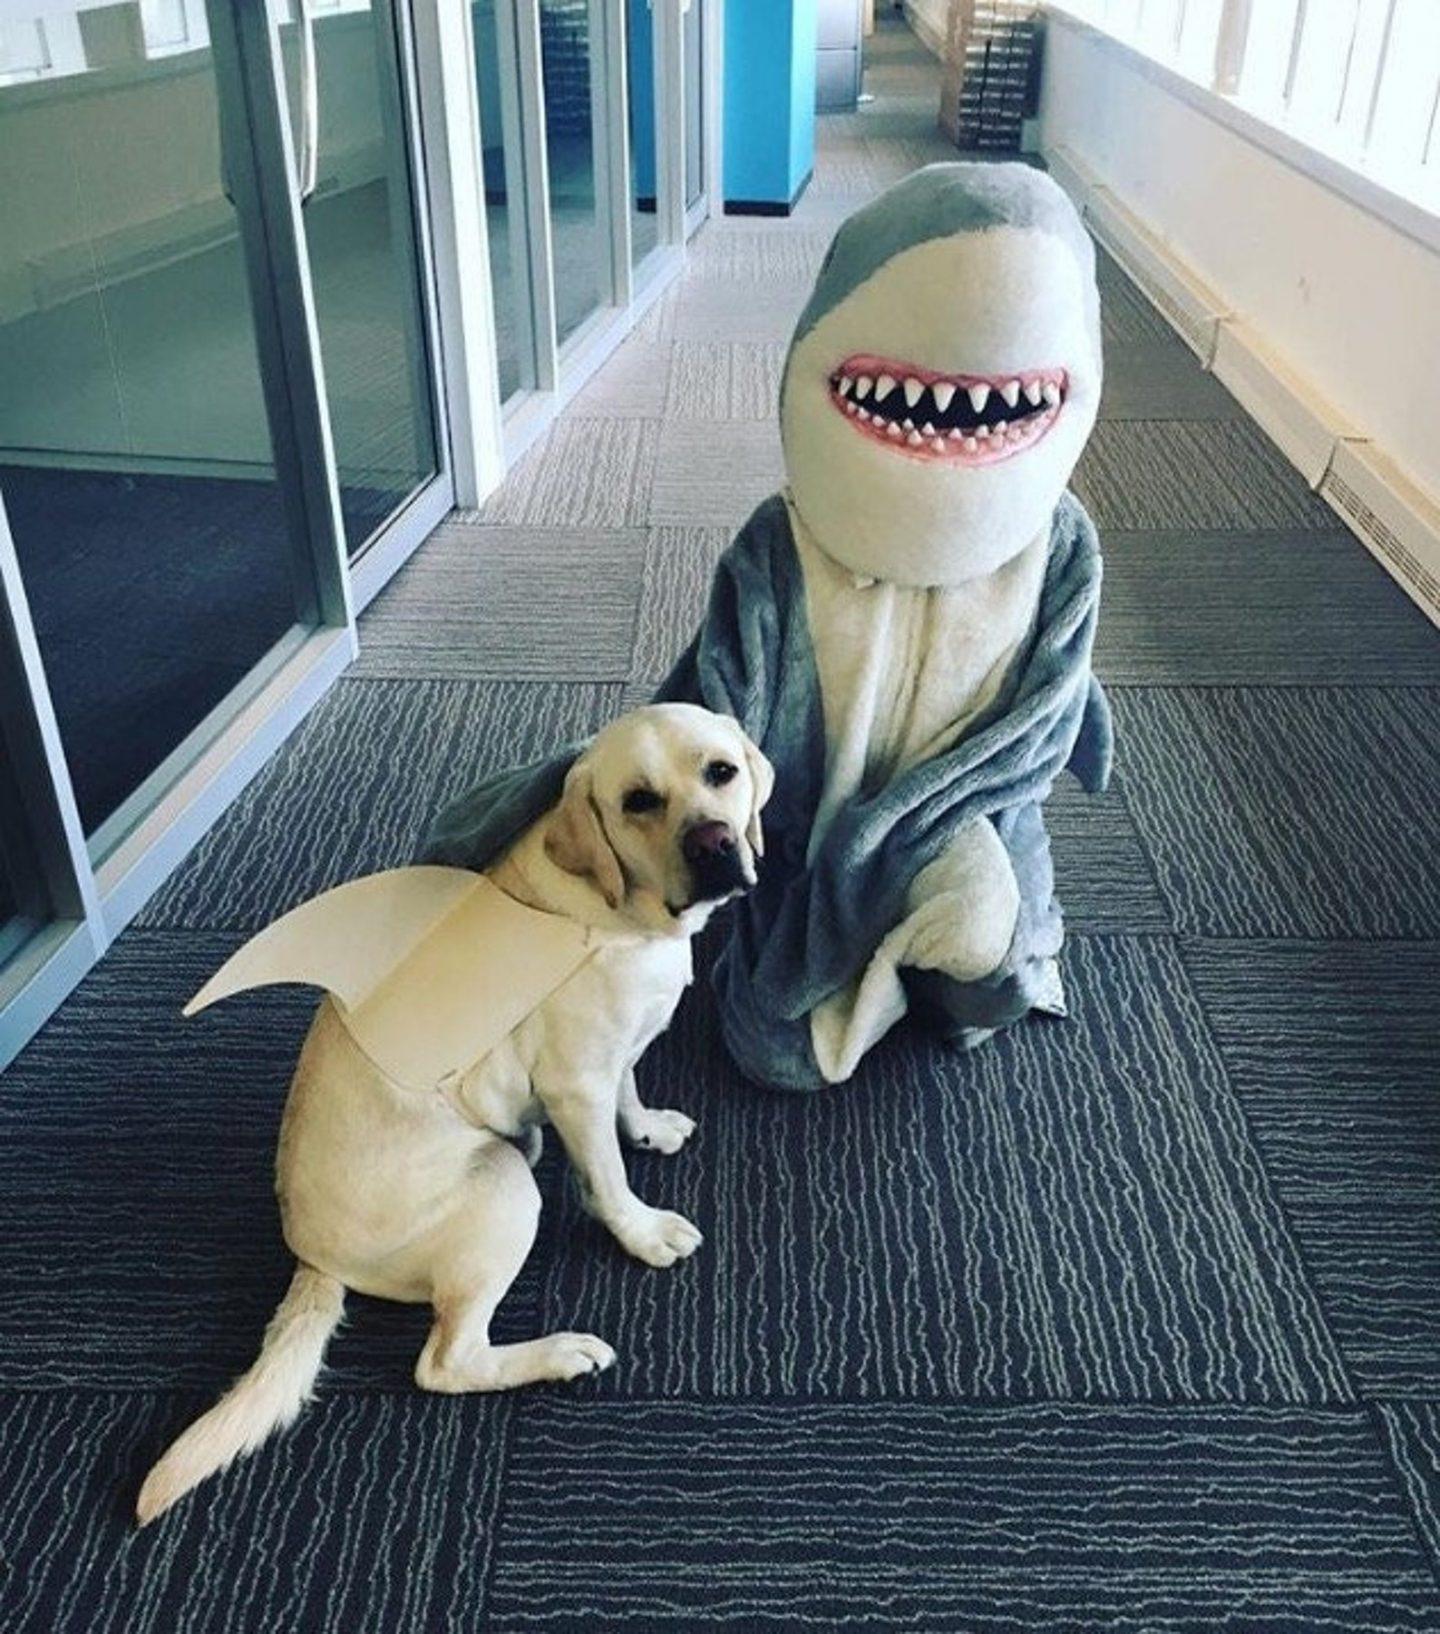 Shark Halloween costume for dogs